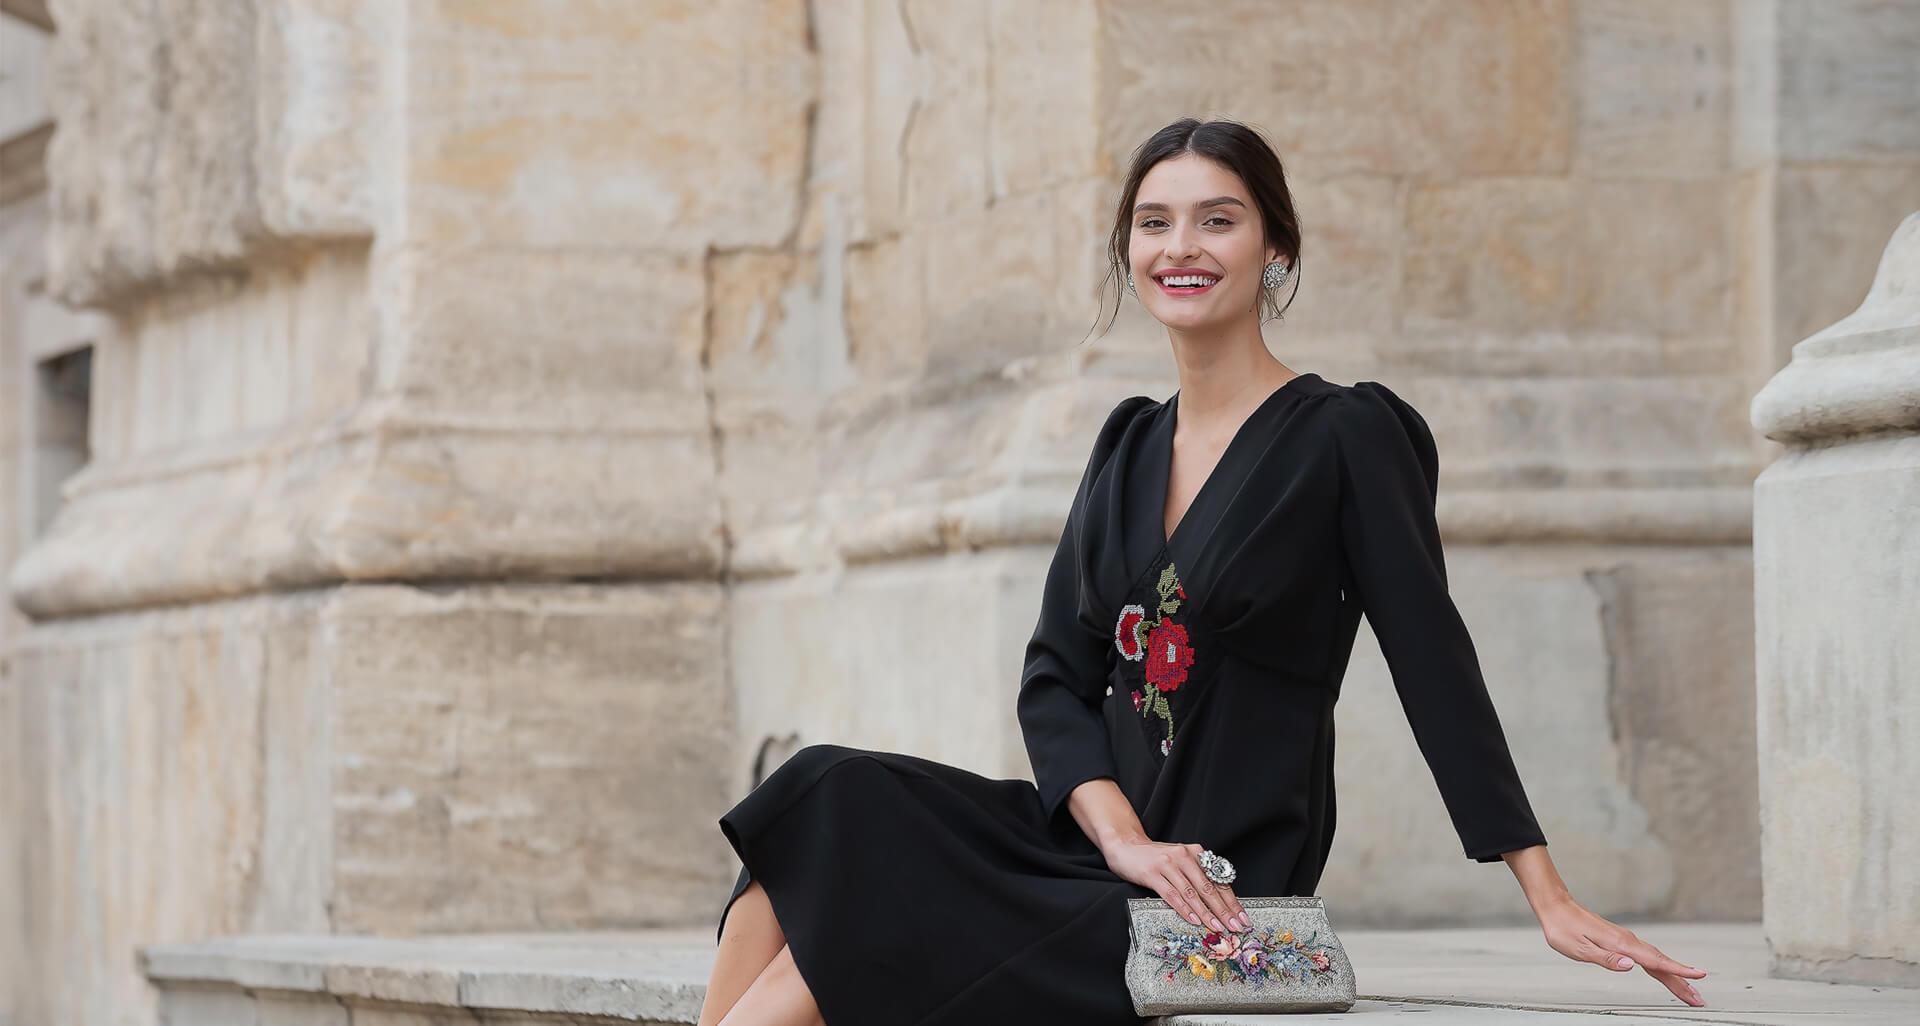 Descopera rochiile din noua colectie de primavara/vara in stil Neoetnic